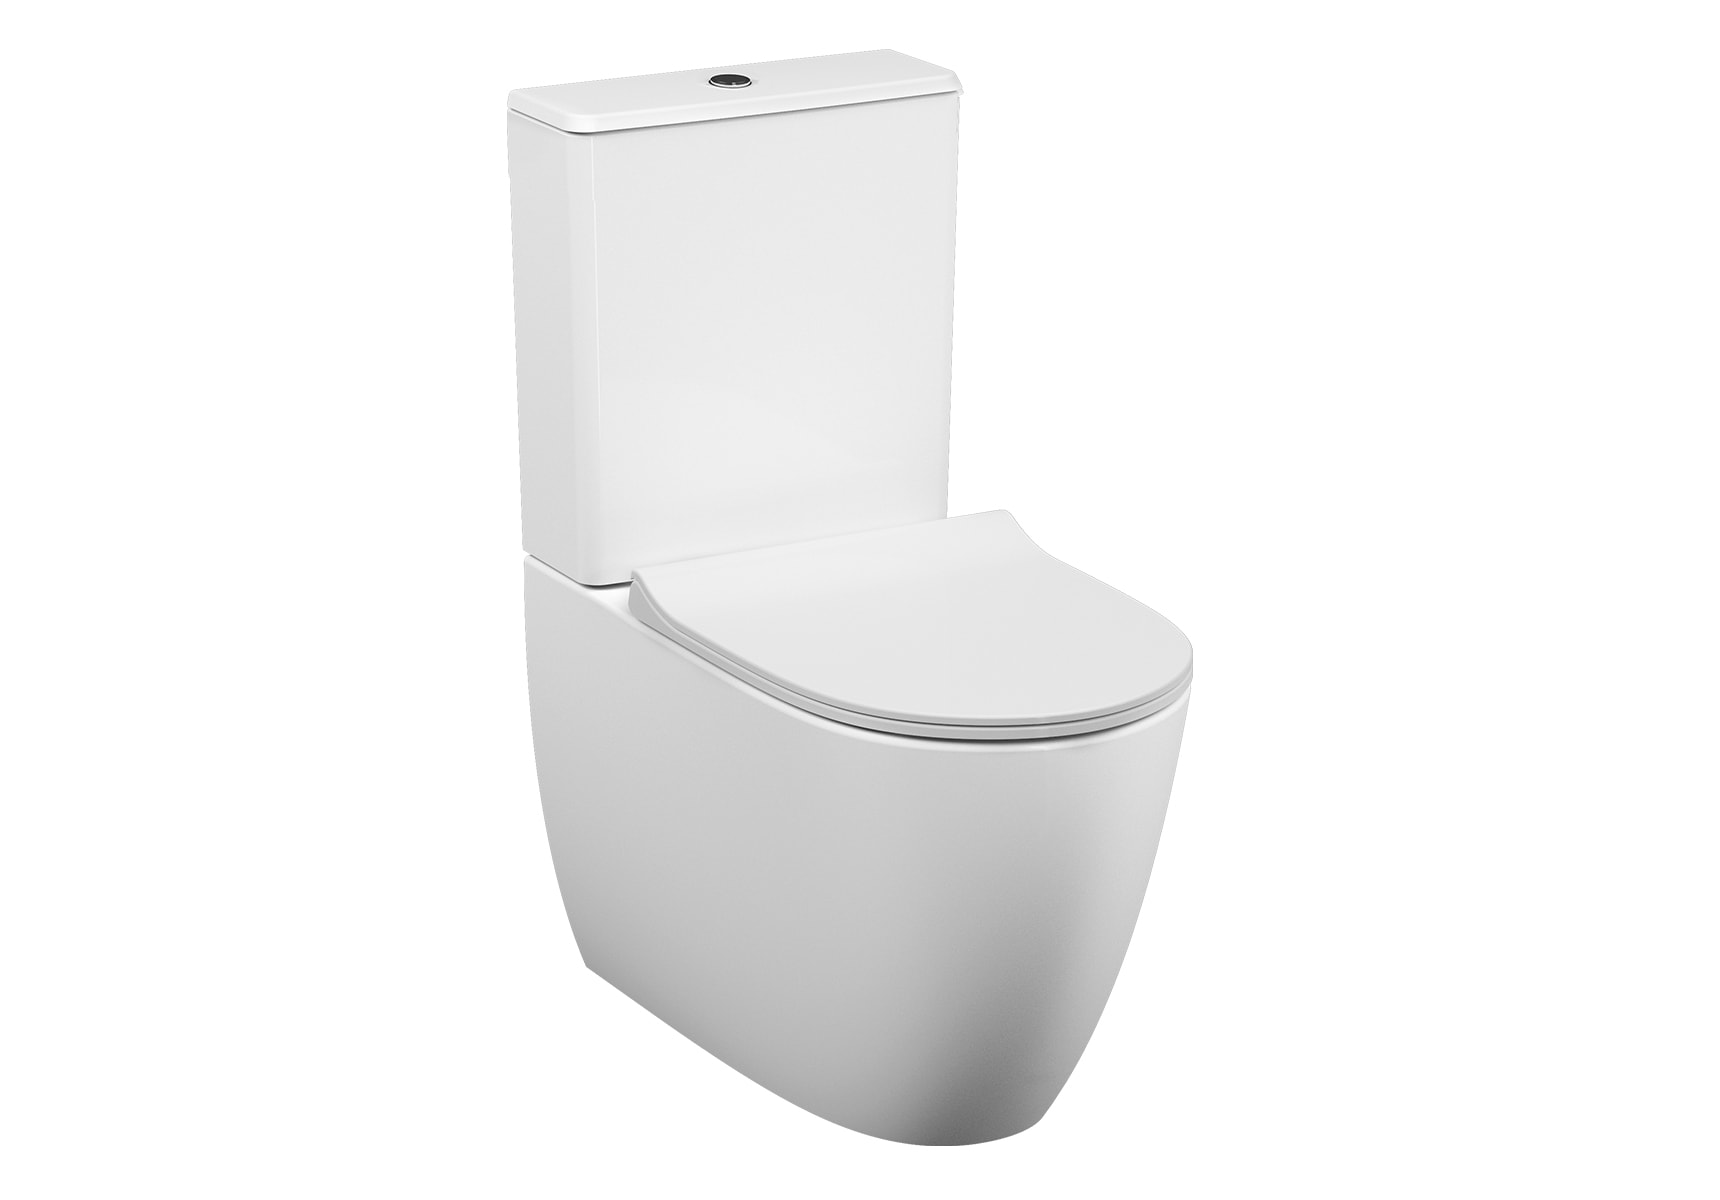 Sento Open Back Close-coupled WC